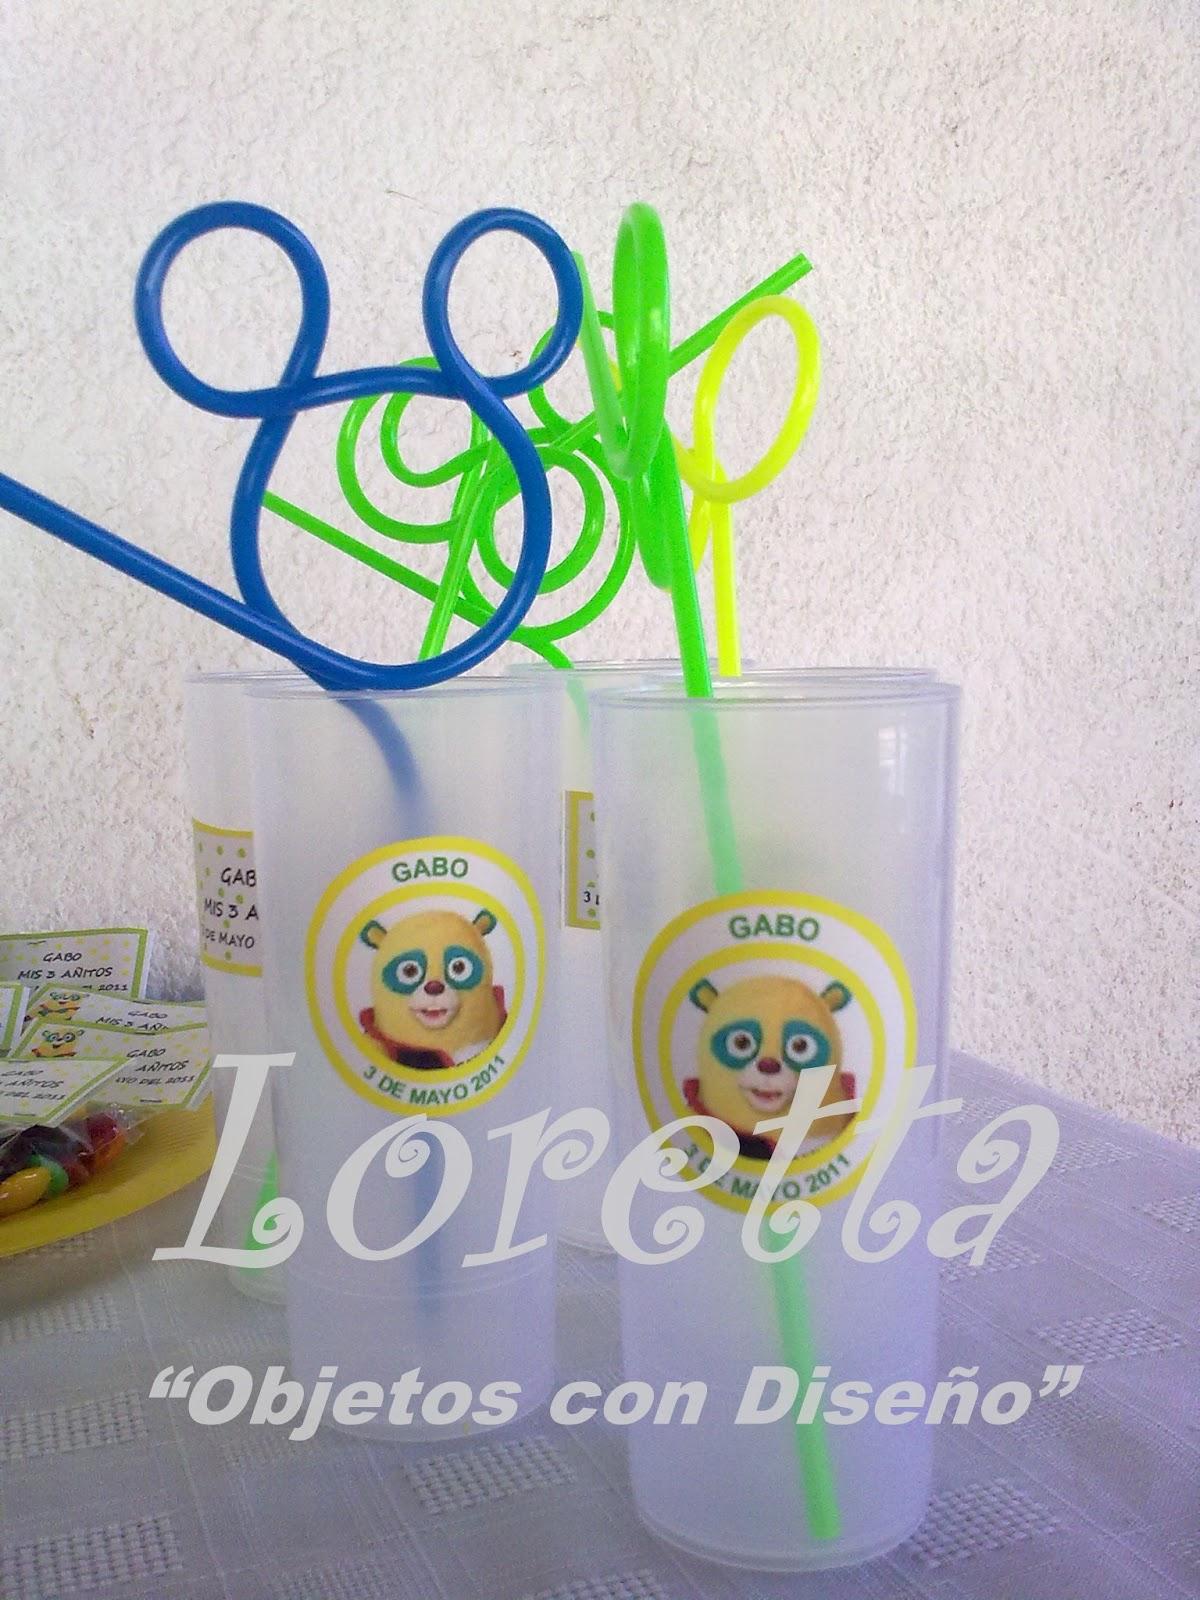 Loretta objetos con dise o decoraci n tem tica agente - Objetos decoracion diseno ...